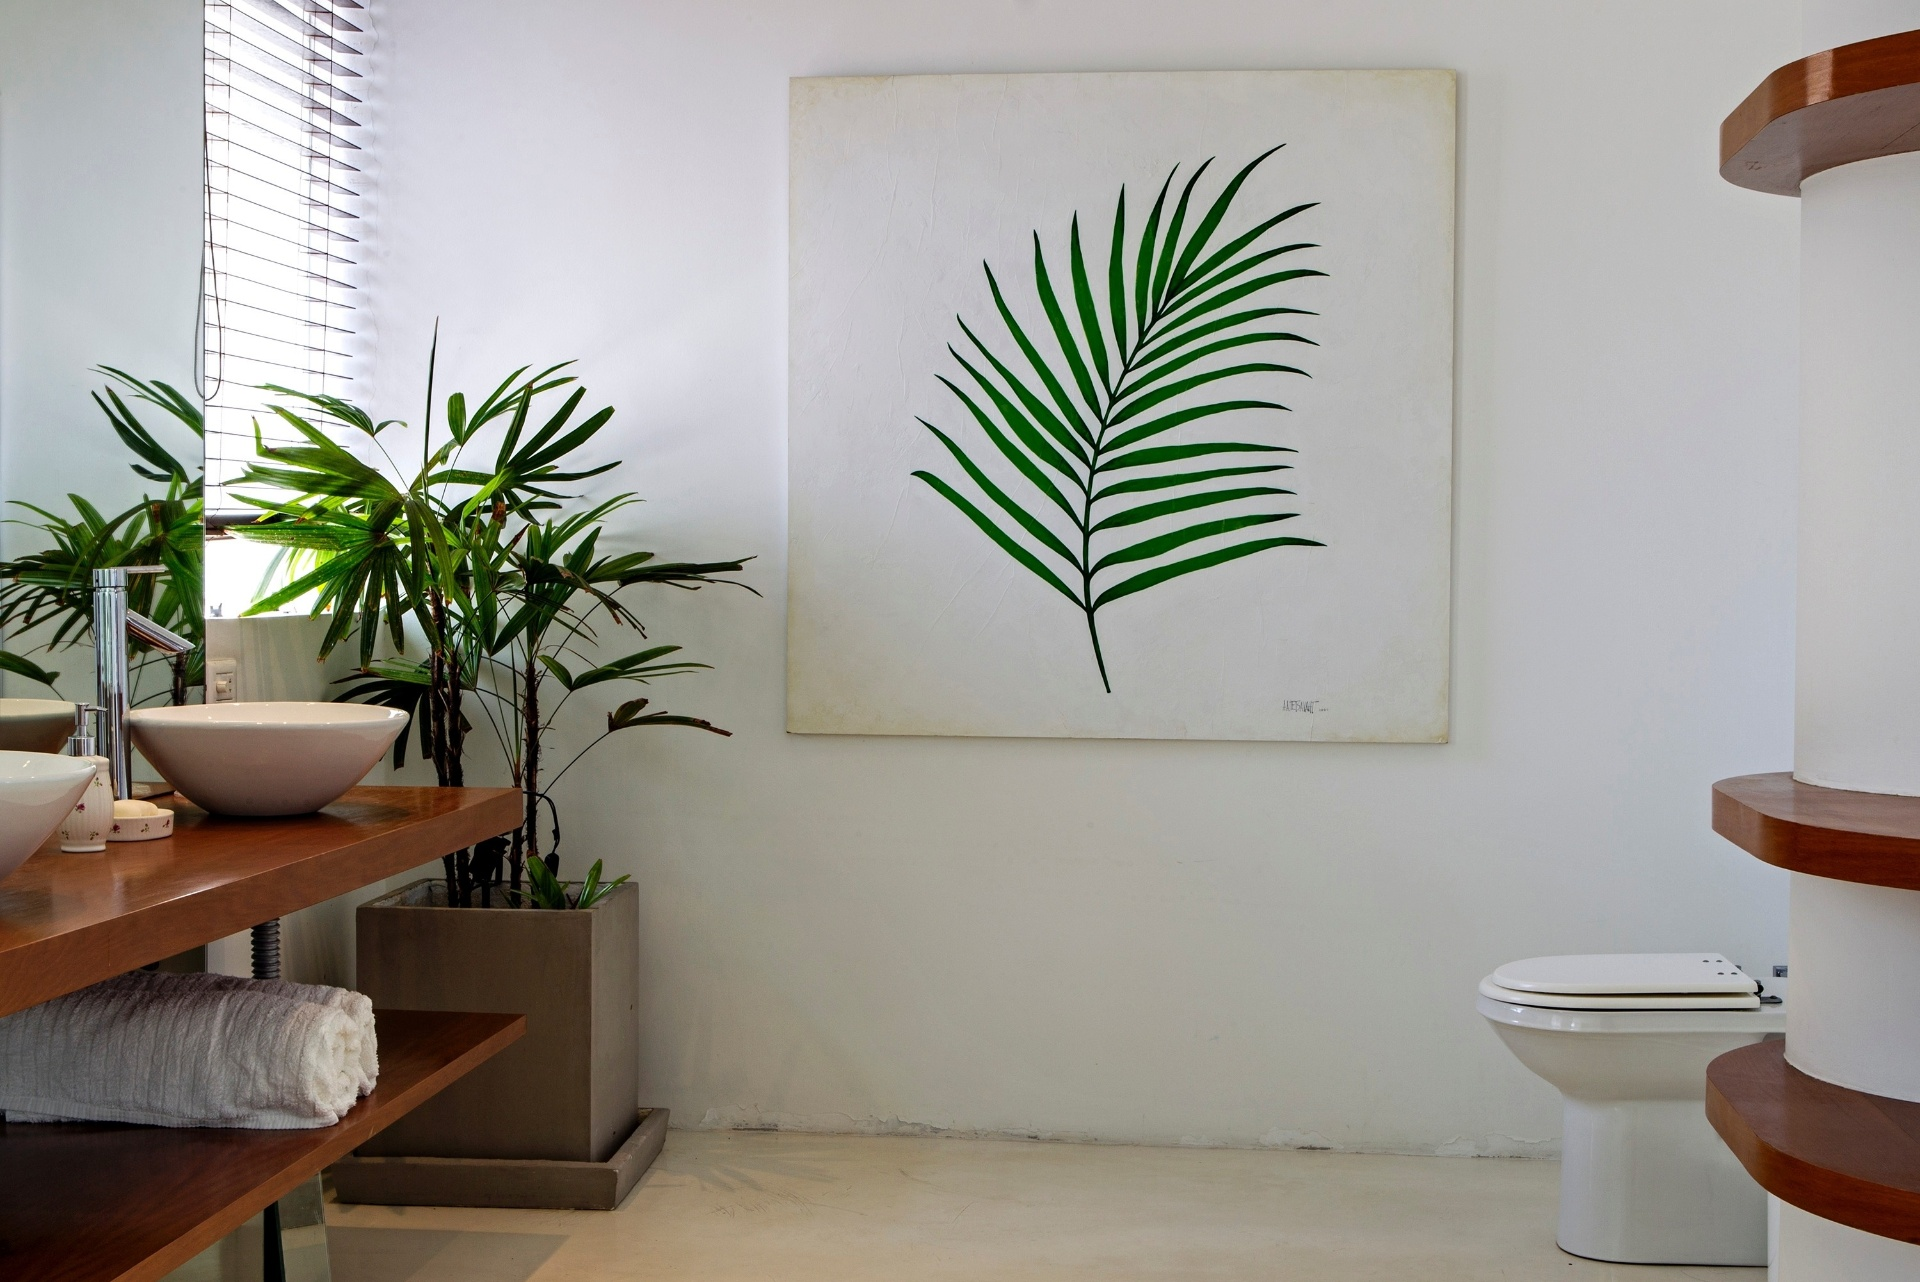 O banheiro da suíte máster acompanha o estilo do apartamento Copacabana, reformado pelo escritório House In Rio: cimento queimado no piso, bancada de madeira peroba e quadro de Ana Amélia Metzavah